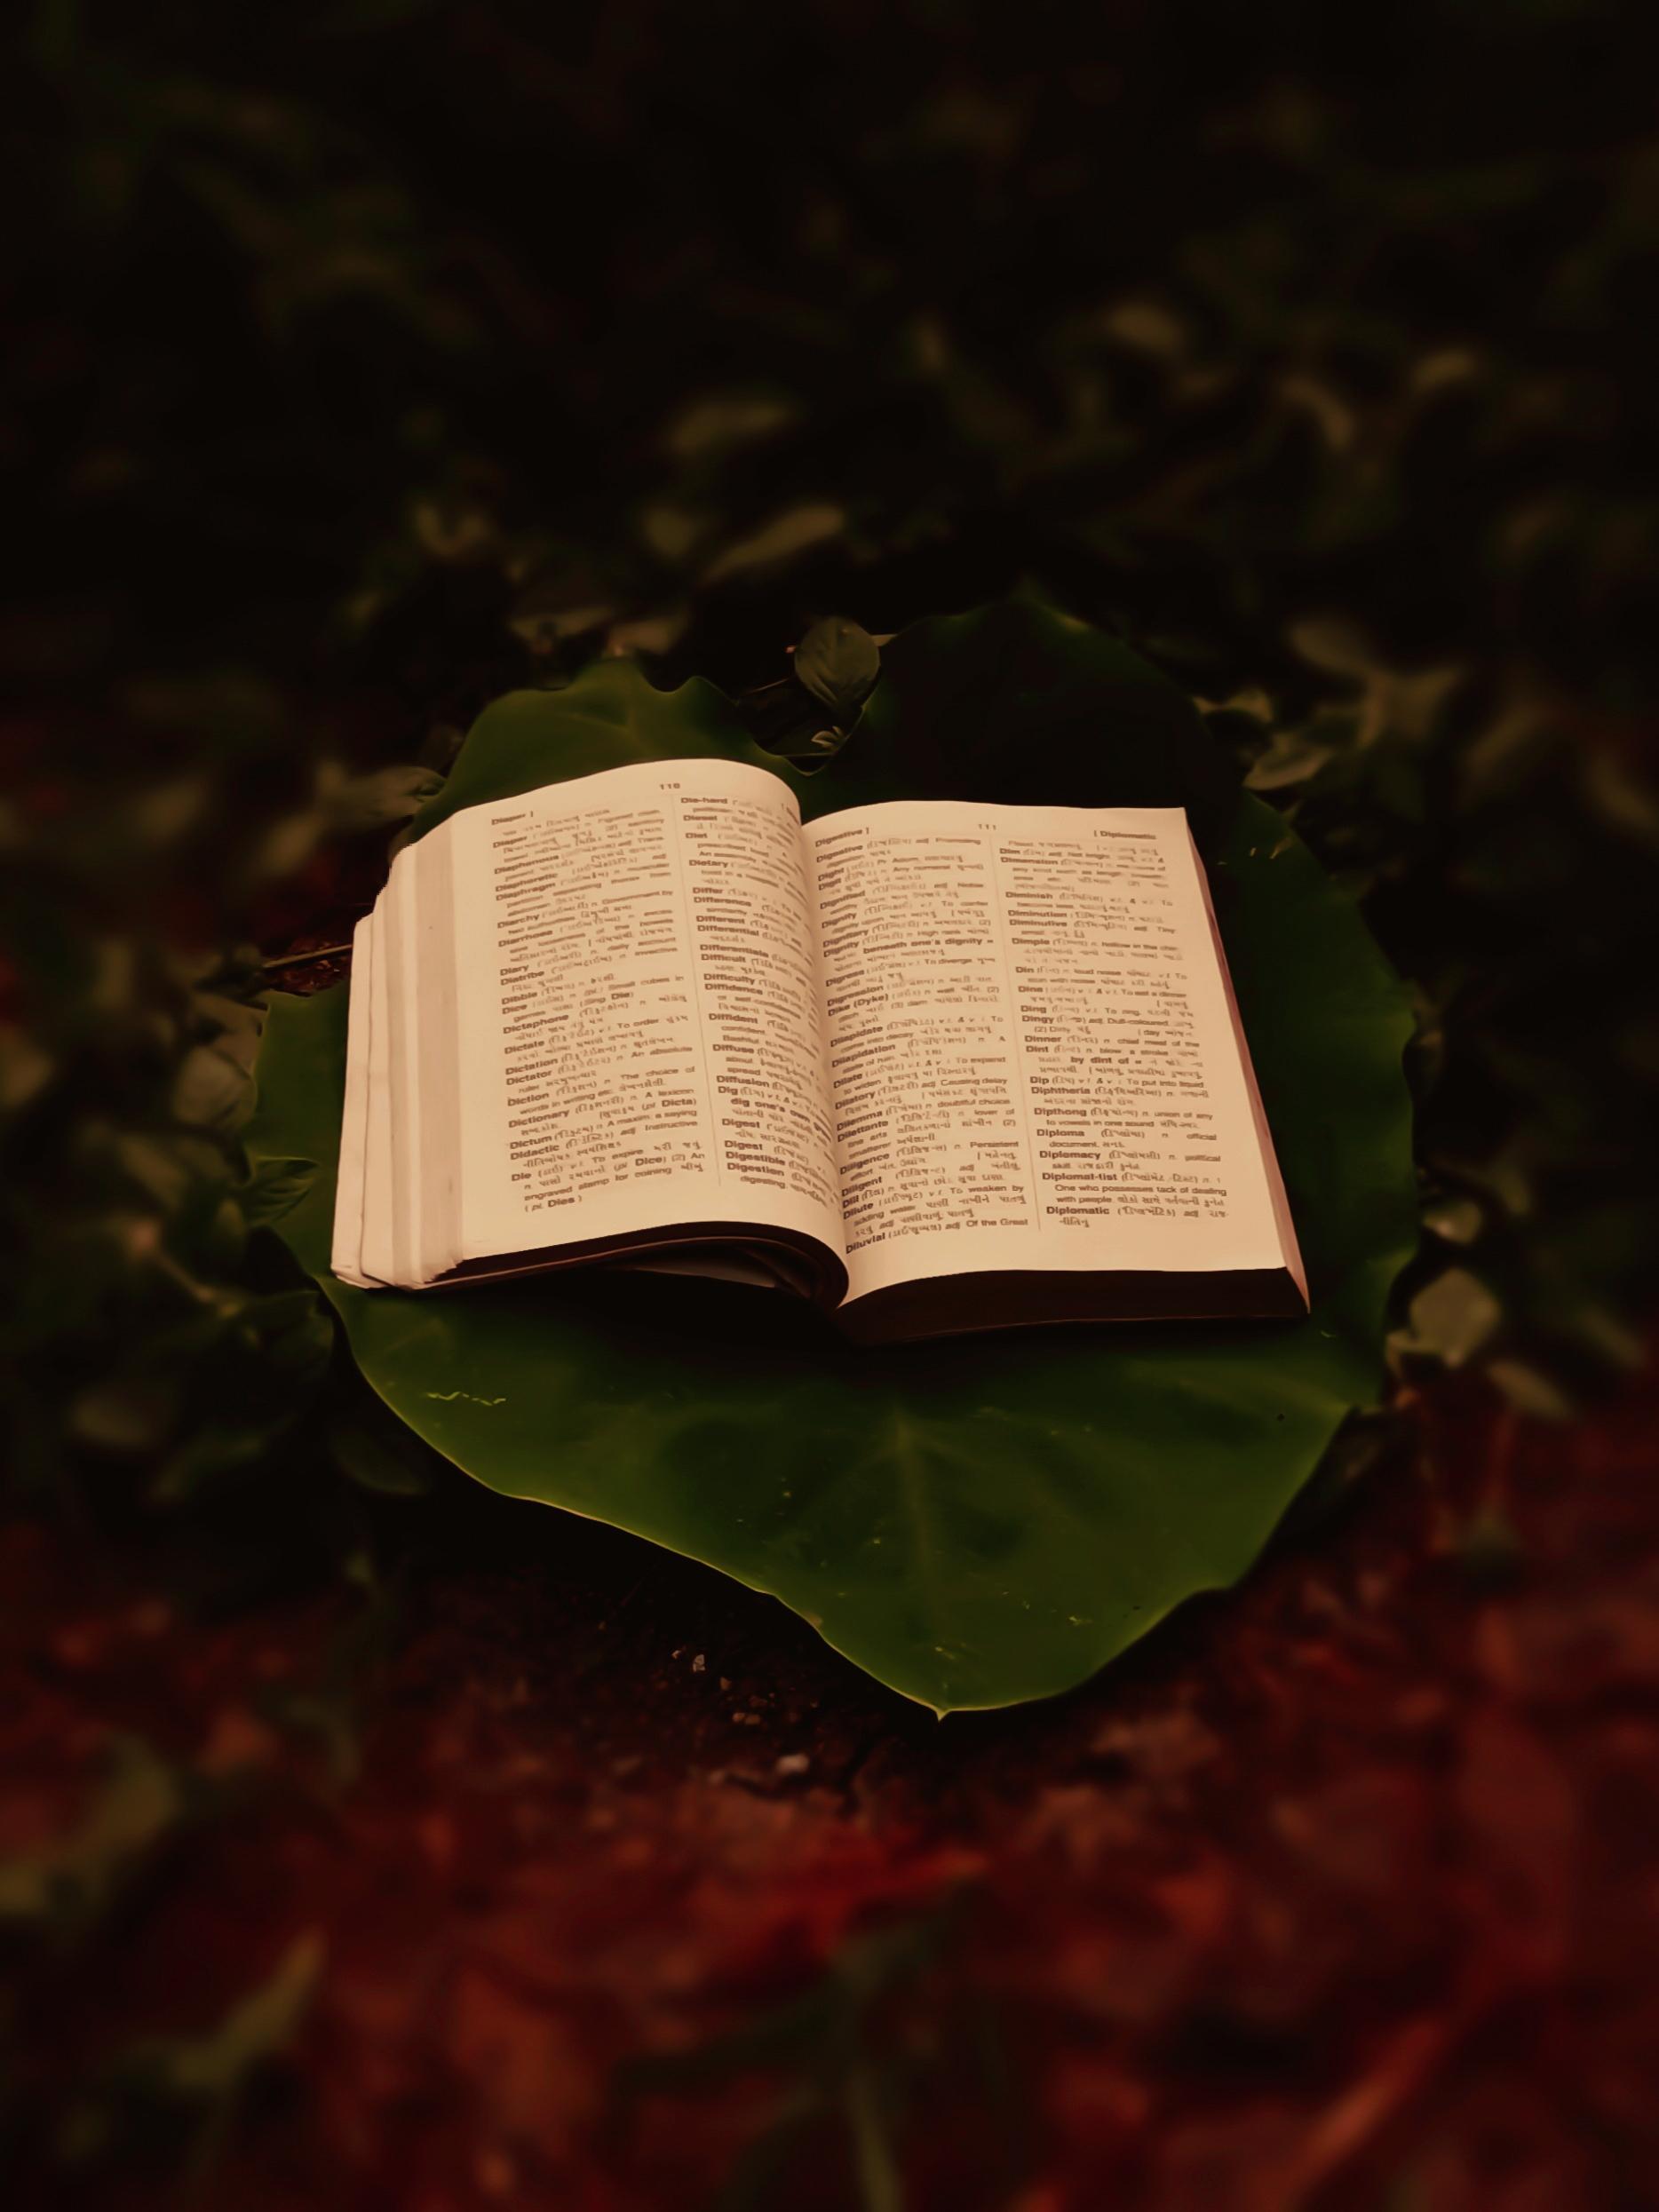 book on a leaf